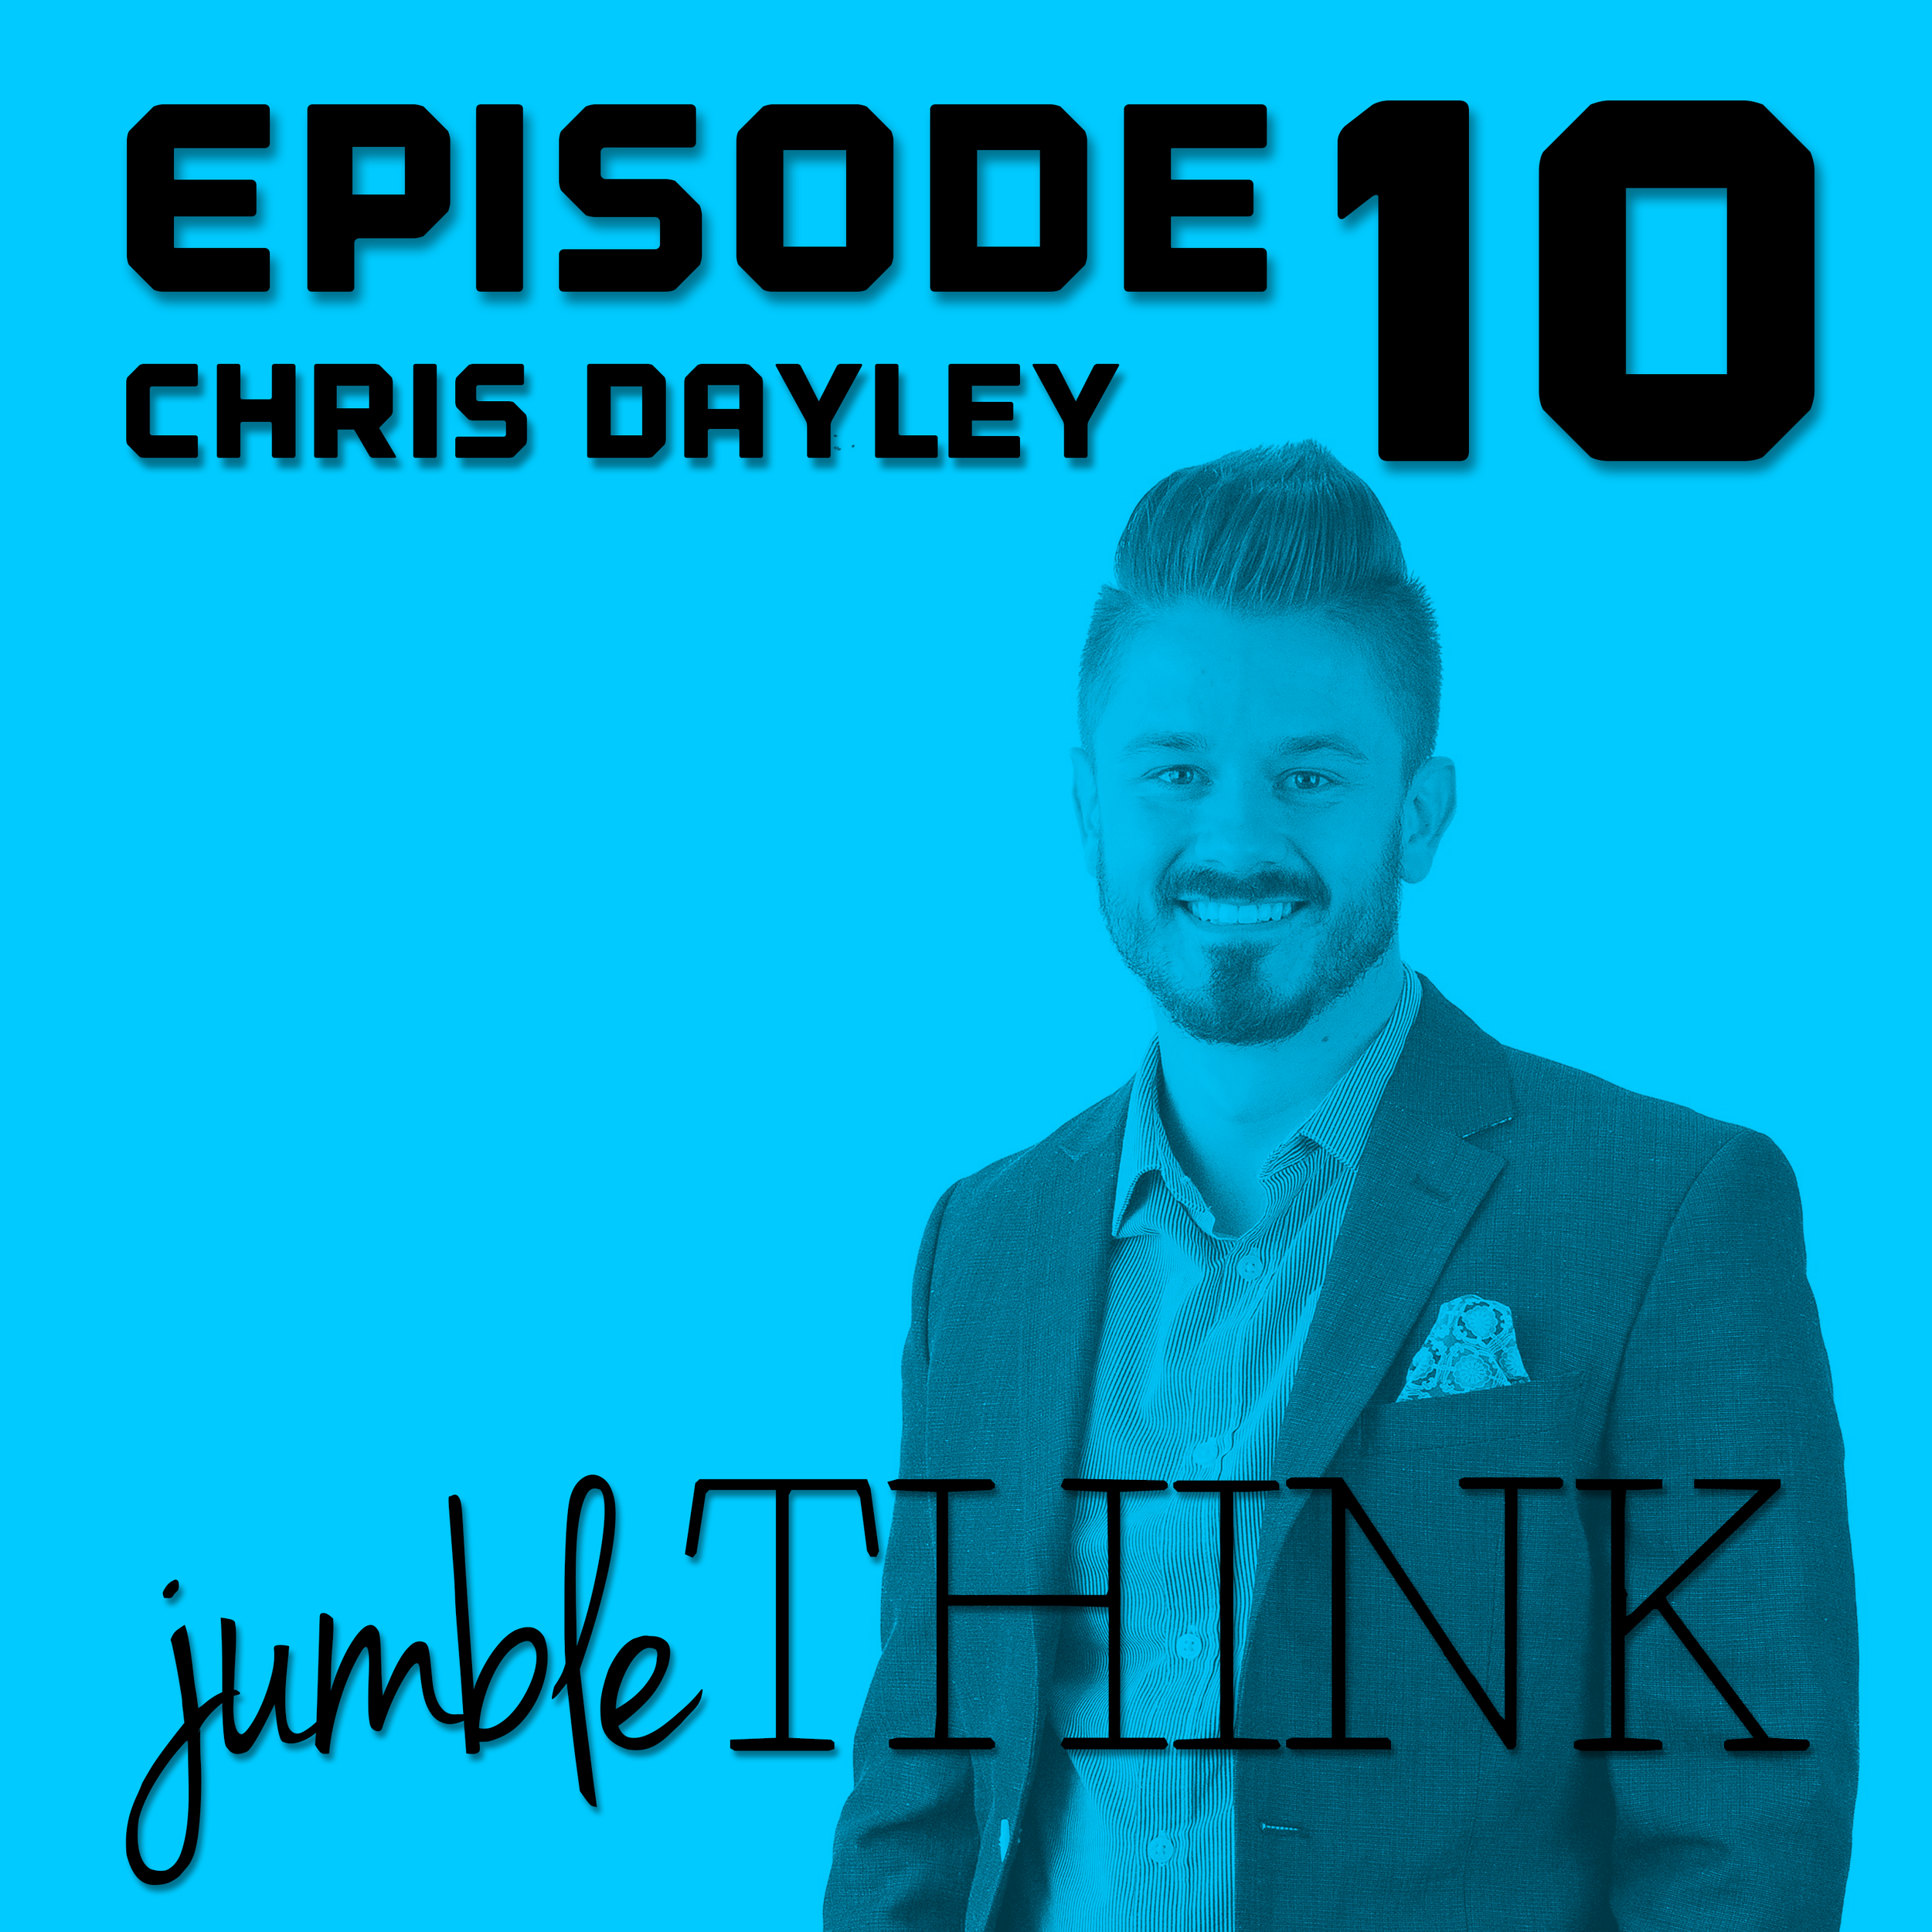 S2E10-Chris-Dayley.png